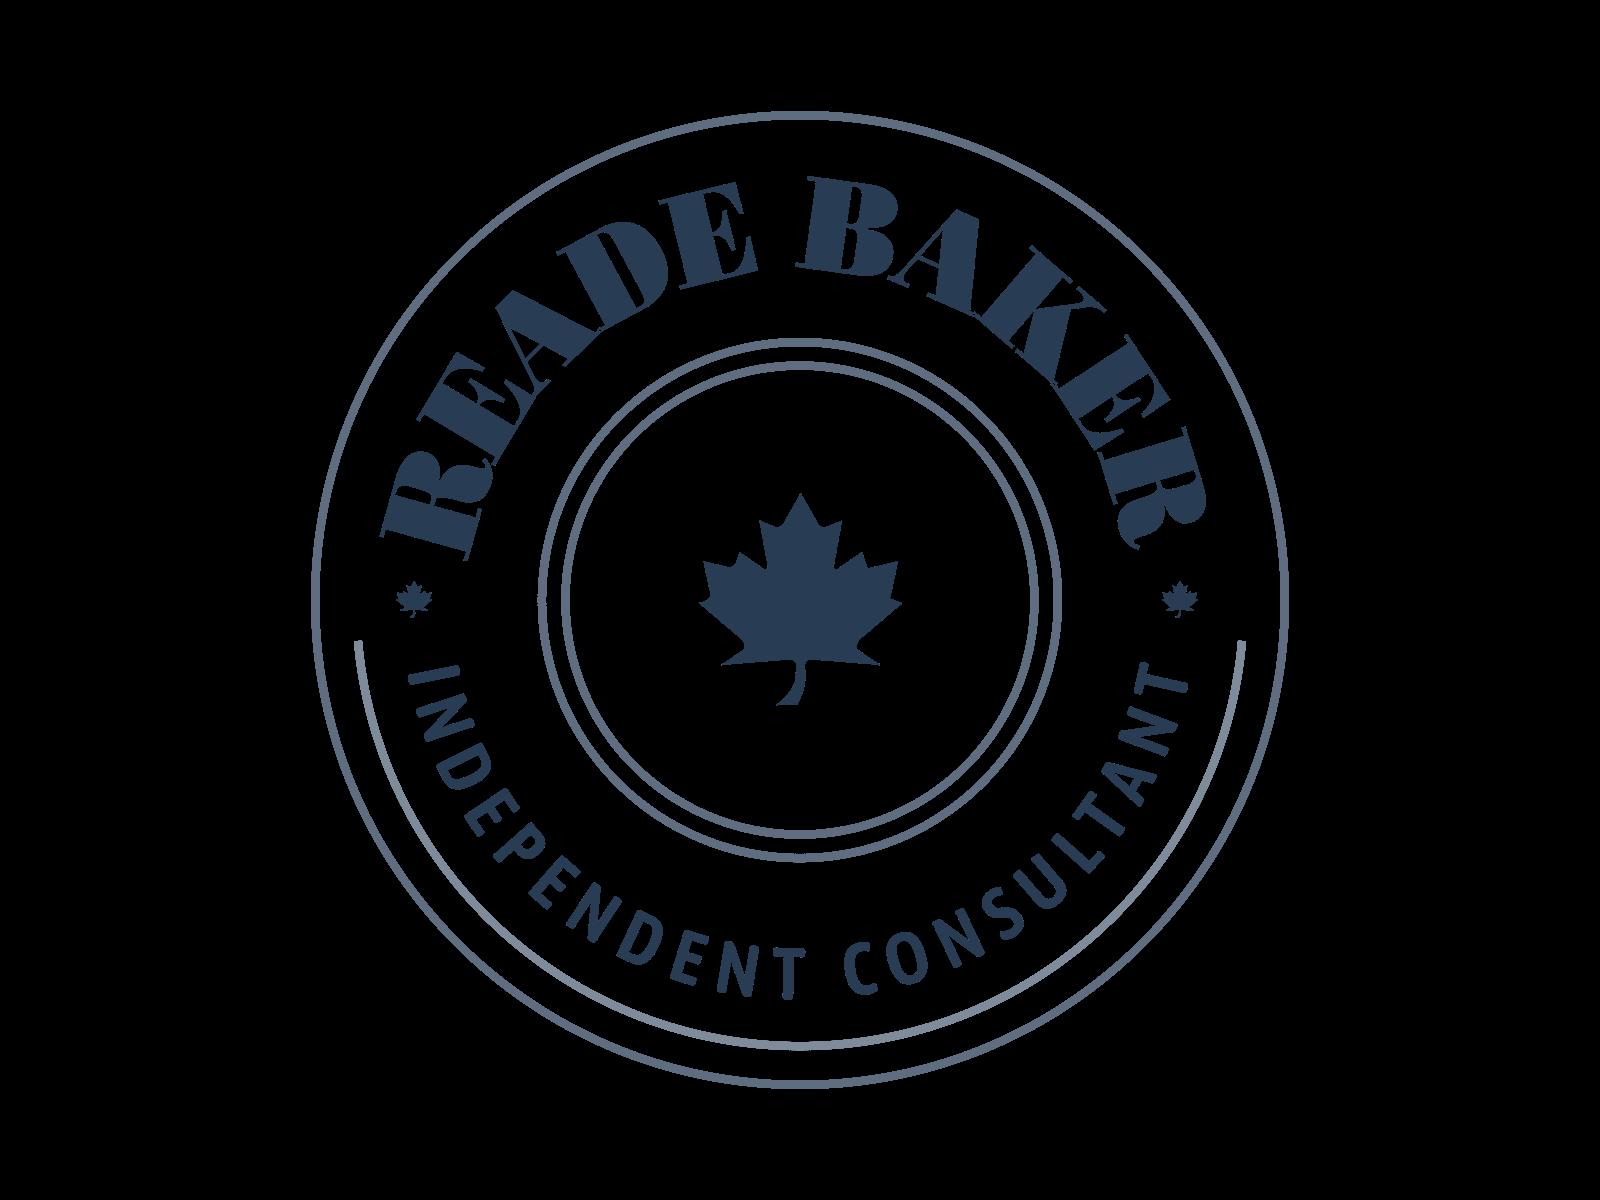 Reade Baker-Circle-1 (2).png